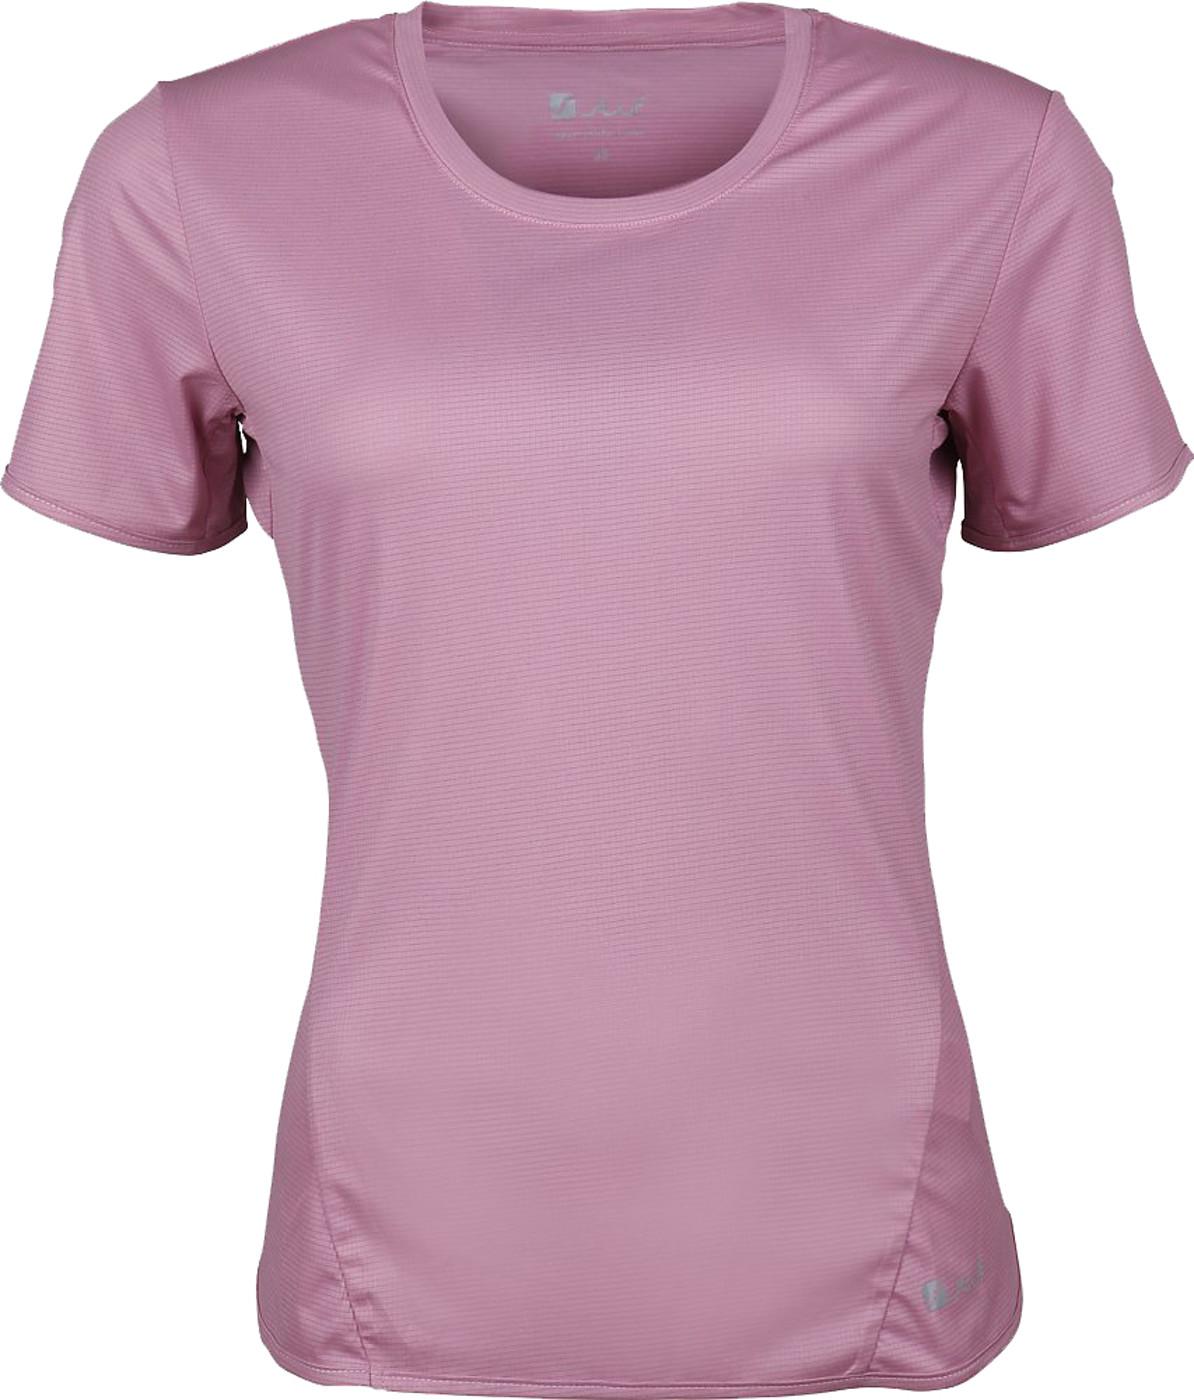 STUF JADA T-Shirt - Damen